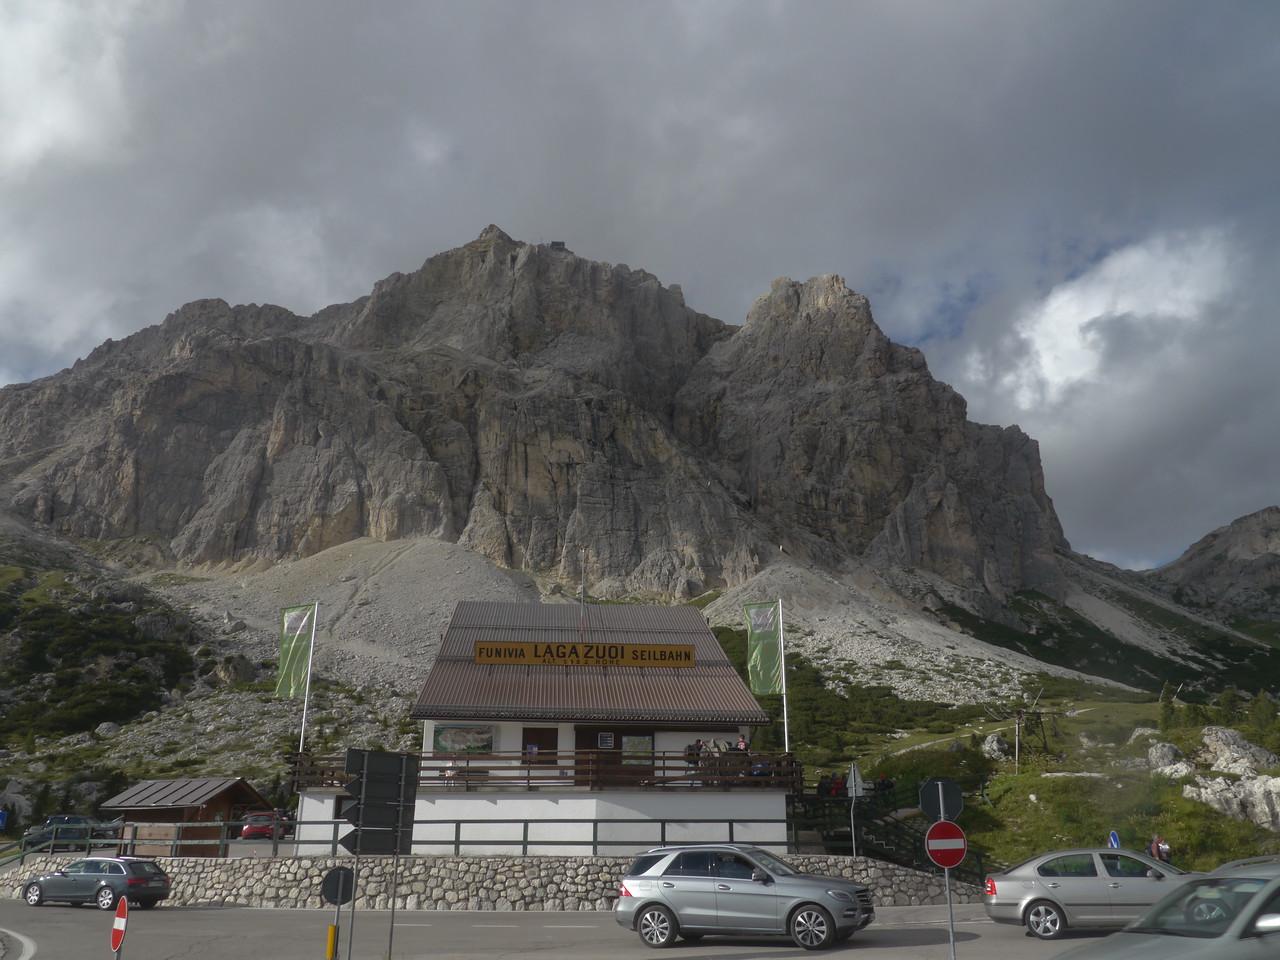 @ 2012 / Pian Falzarego, Livinallongo Del Col Di Lana, Veneto, ITA, Italien, 2096 m ü/M, 17/08/2014 18:03:57